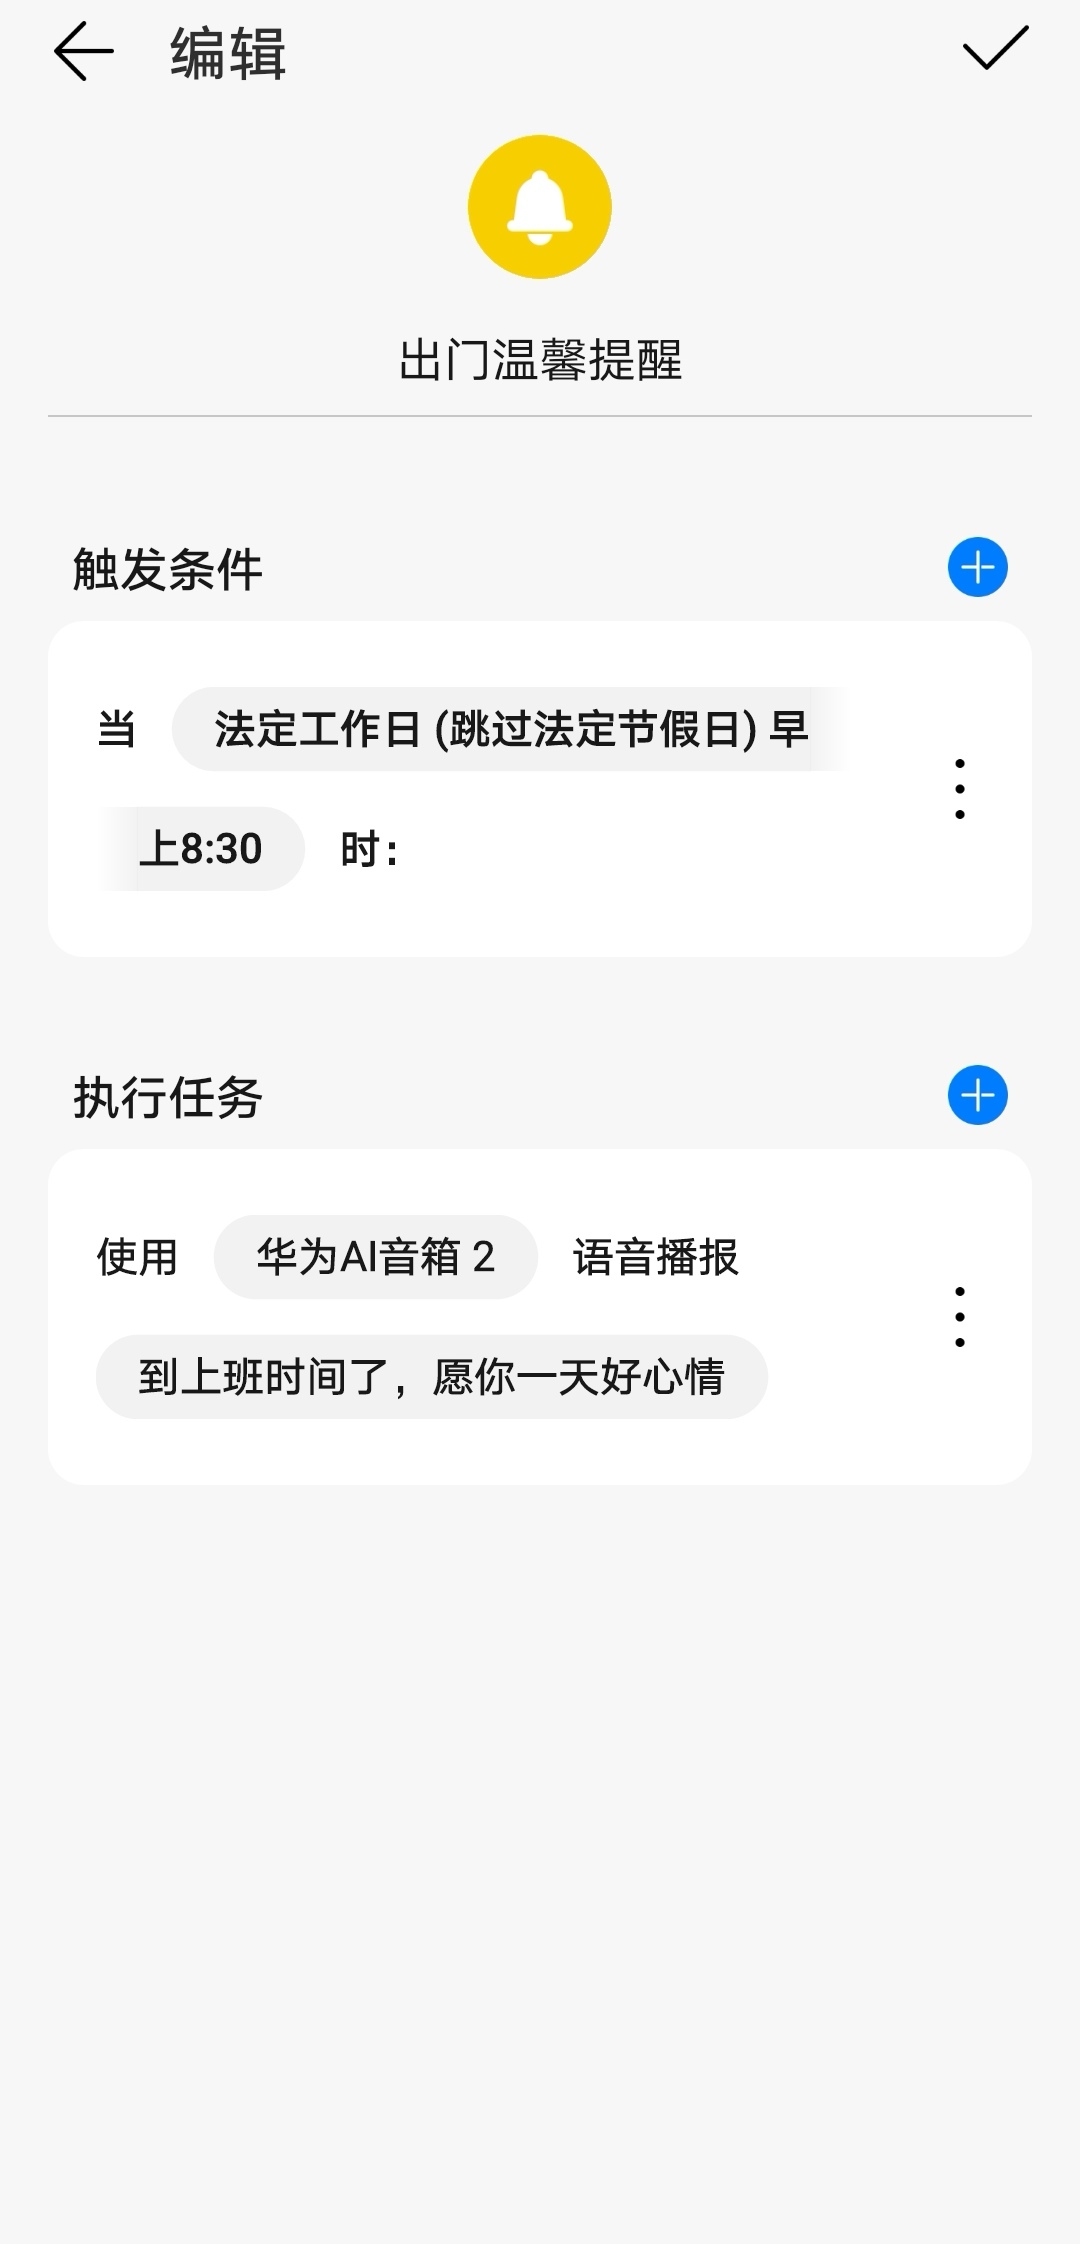 Screenshot_20210403_164449_com.huawei.smarthome_edit_24653564912383.jpg